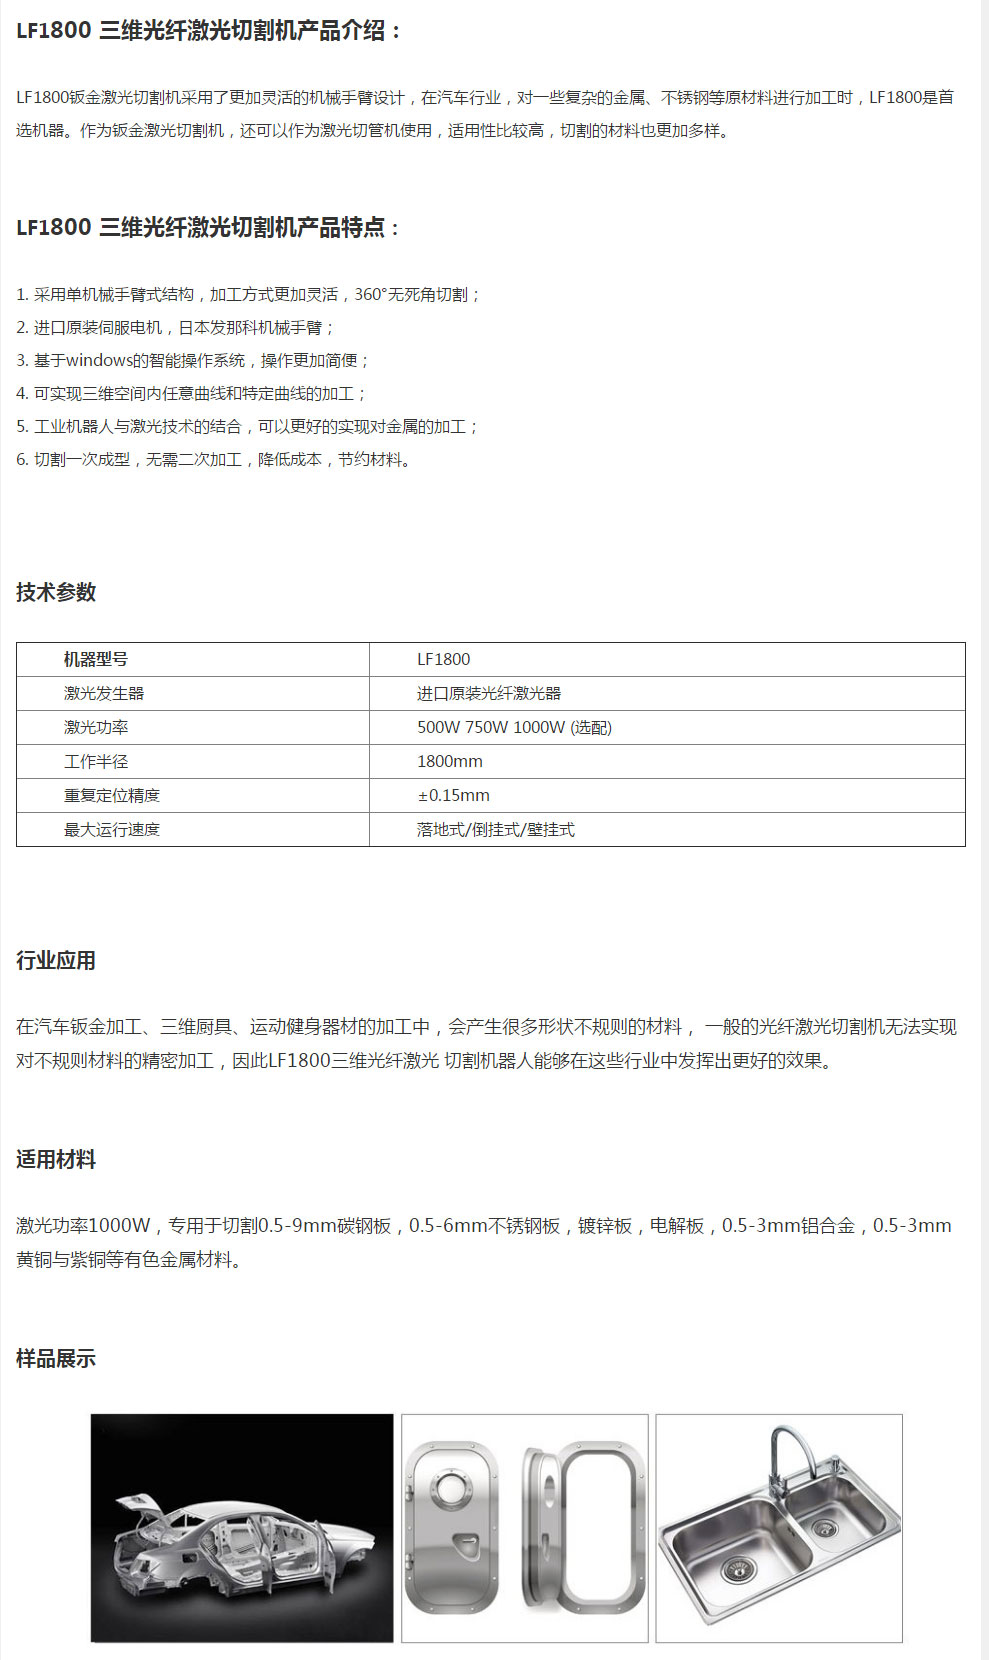 LF1800-三维光纤激光bwin手机网页说明.jpg